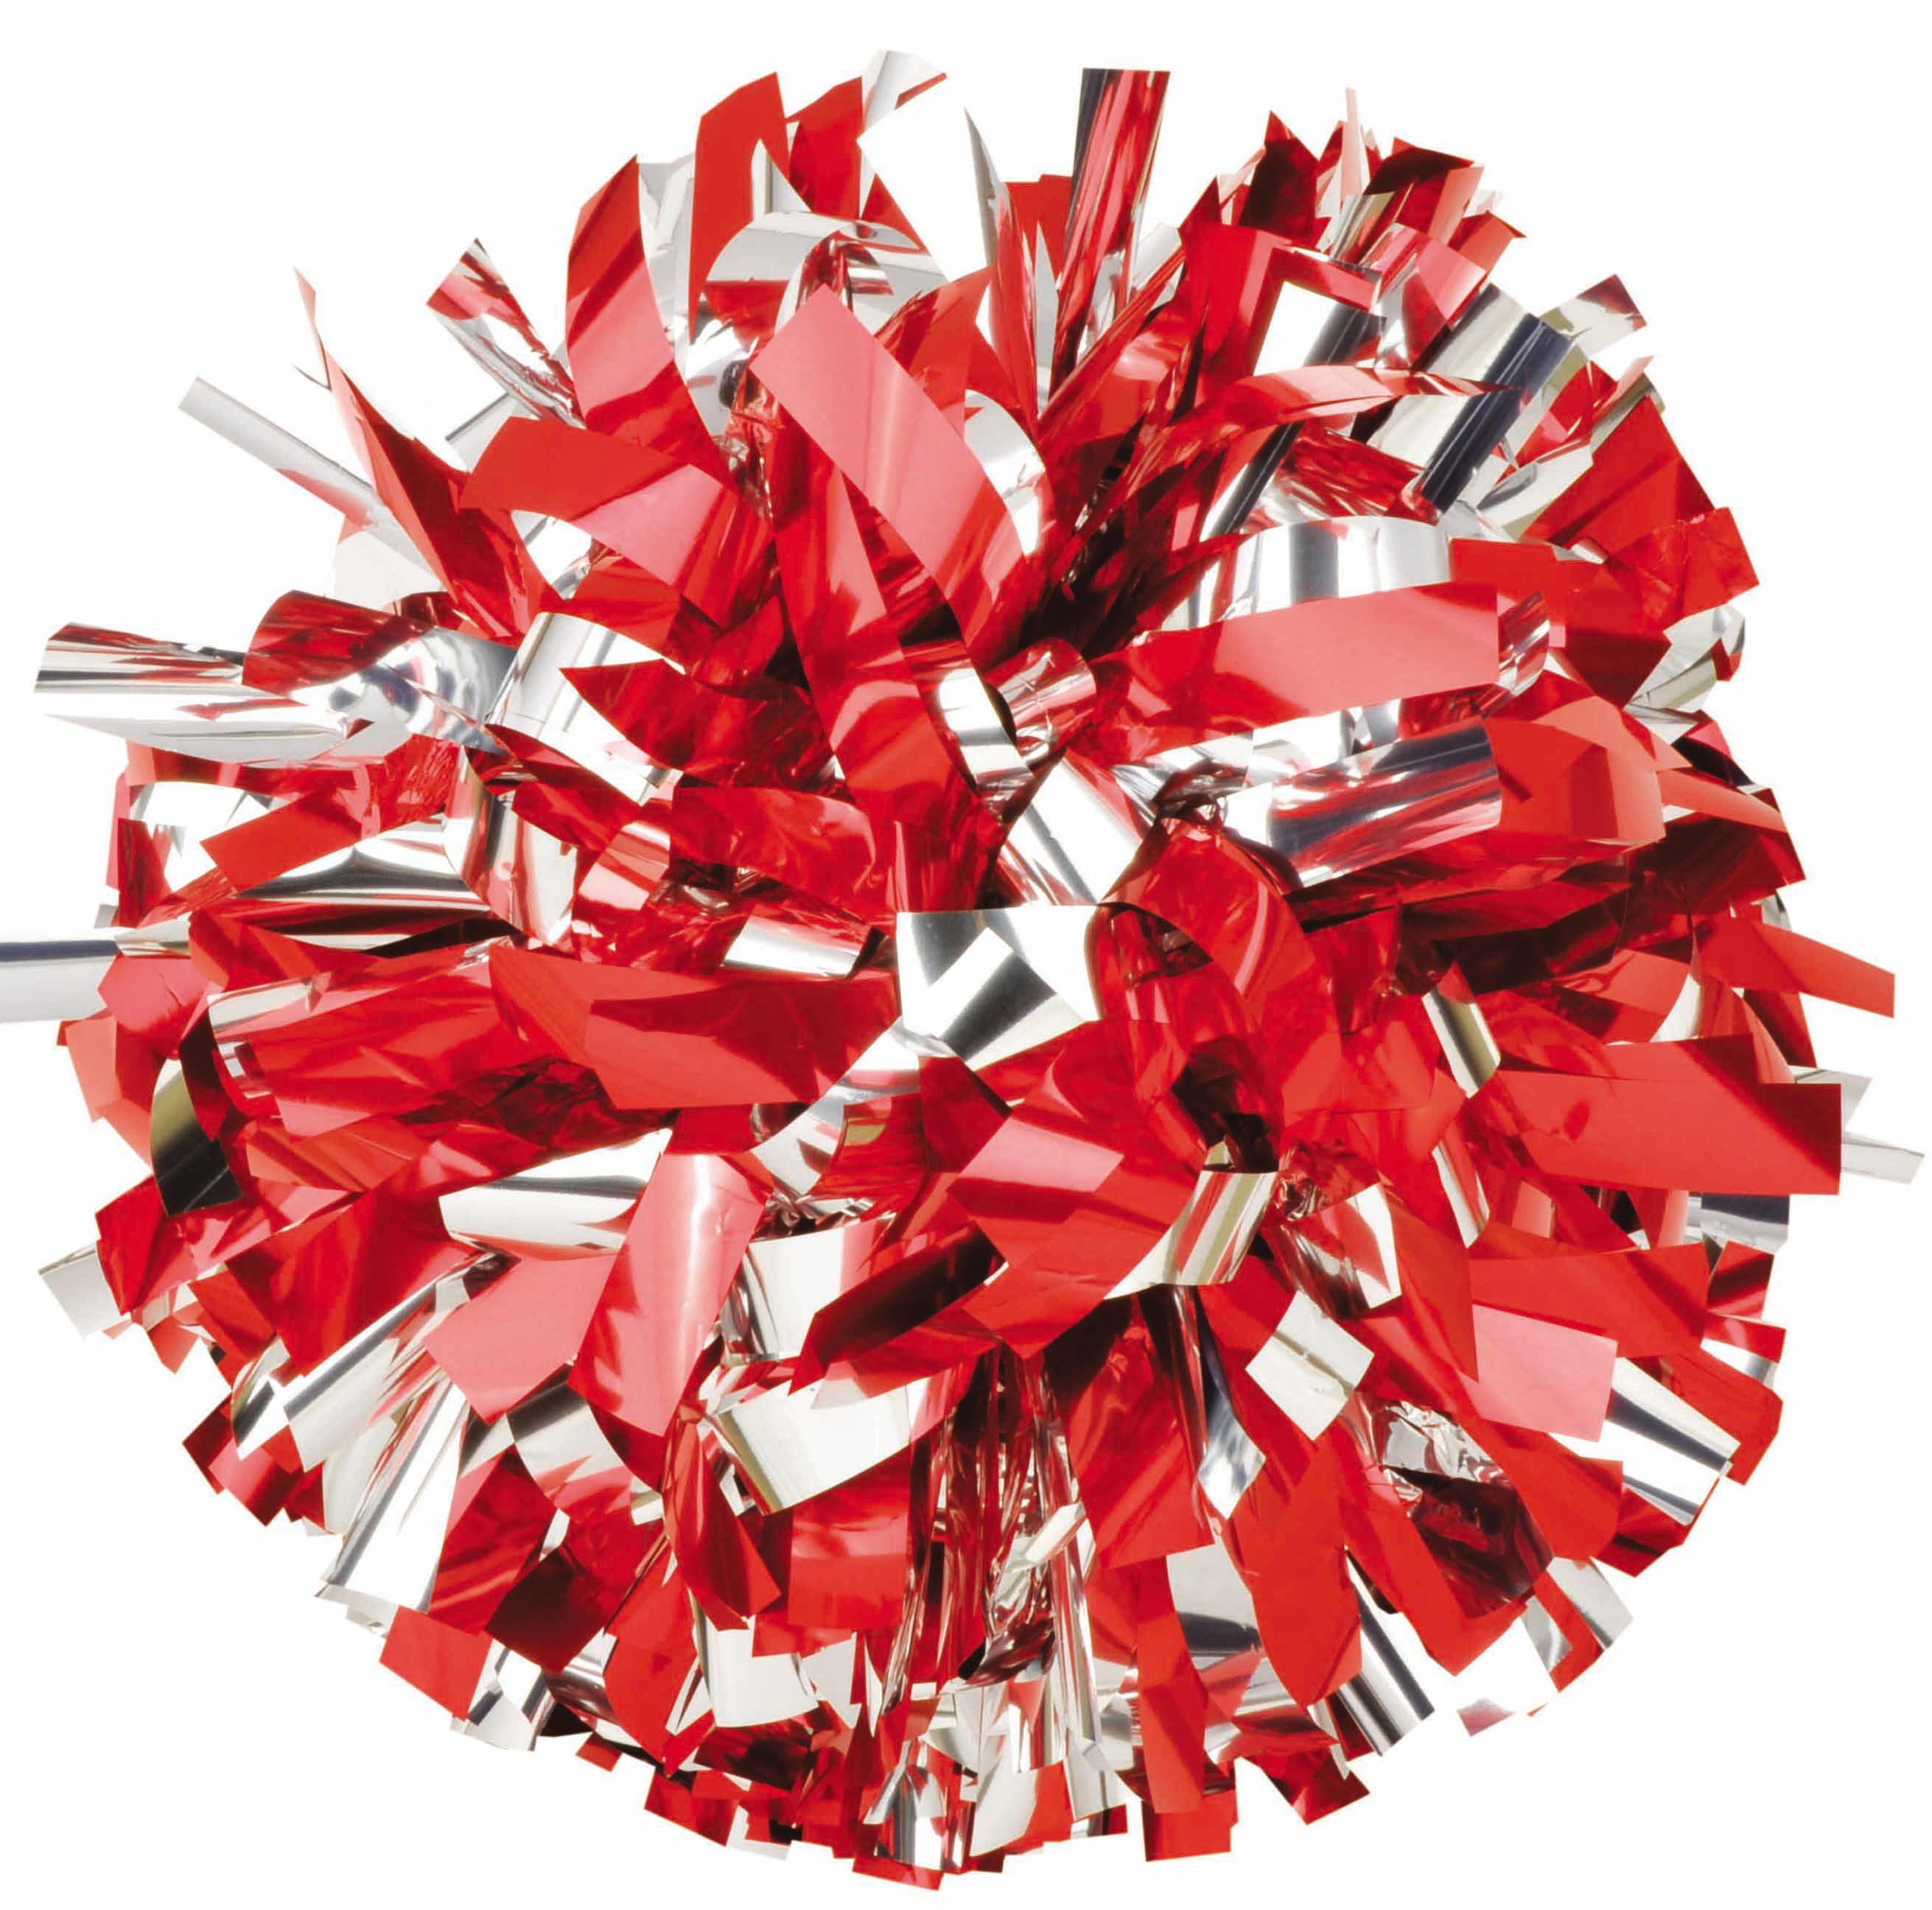 Red pom poms clipart png transparent Free Maroon Poms Cliparts, Download Free Clip Art, Free Clip ... png transparent